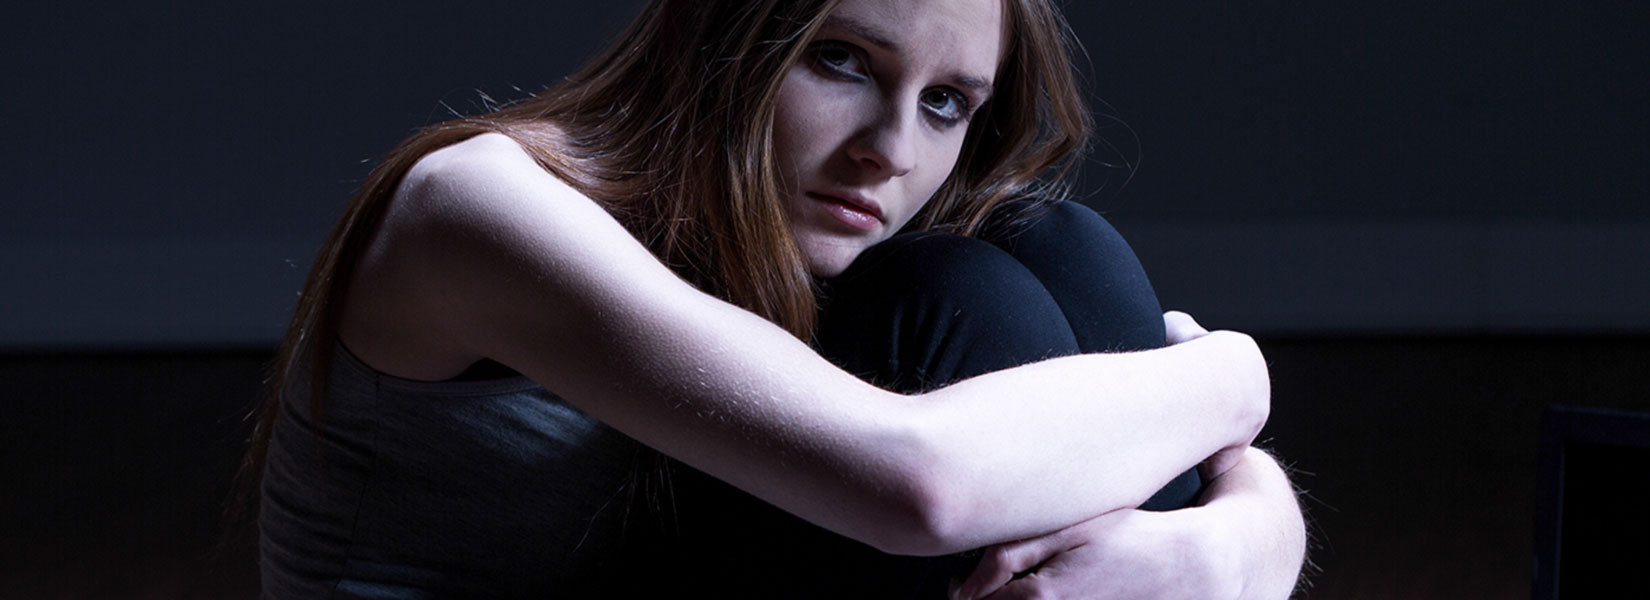 Is an Intervention Necessary? | Addiction Treatment Center